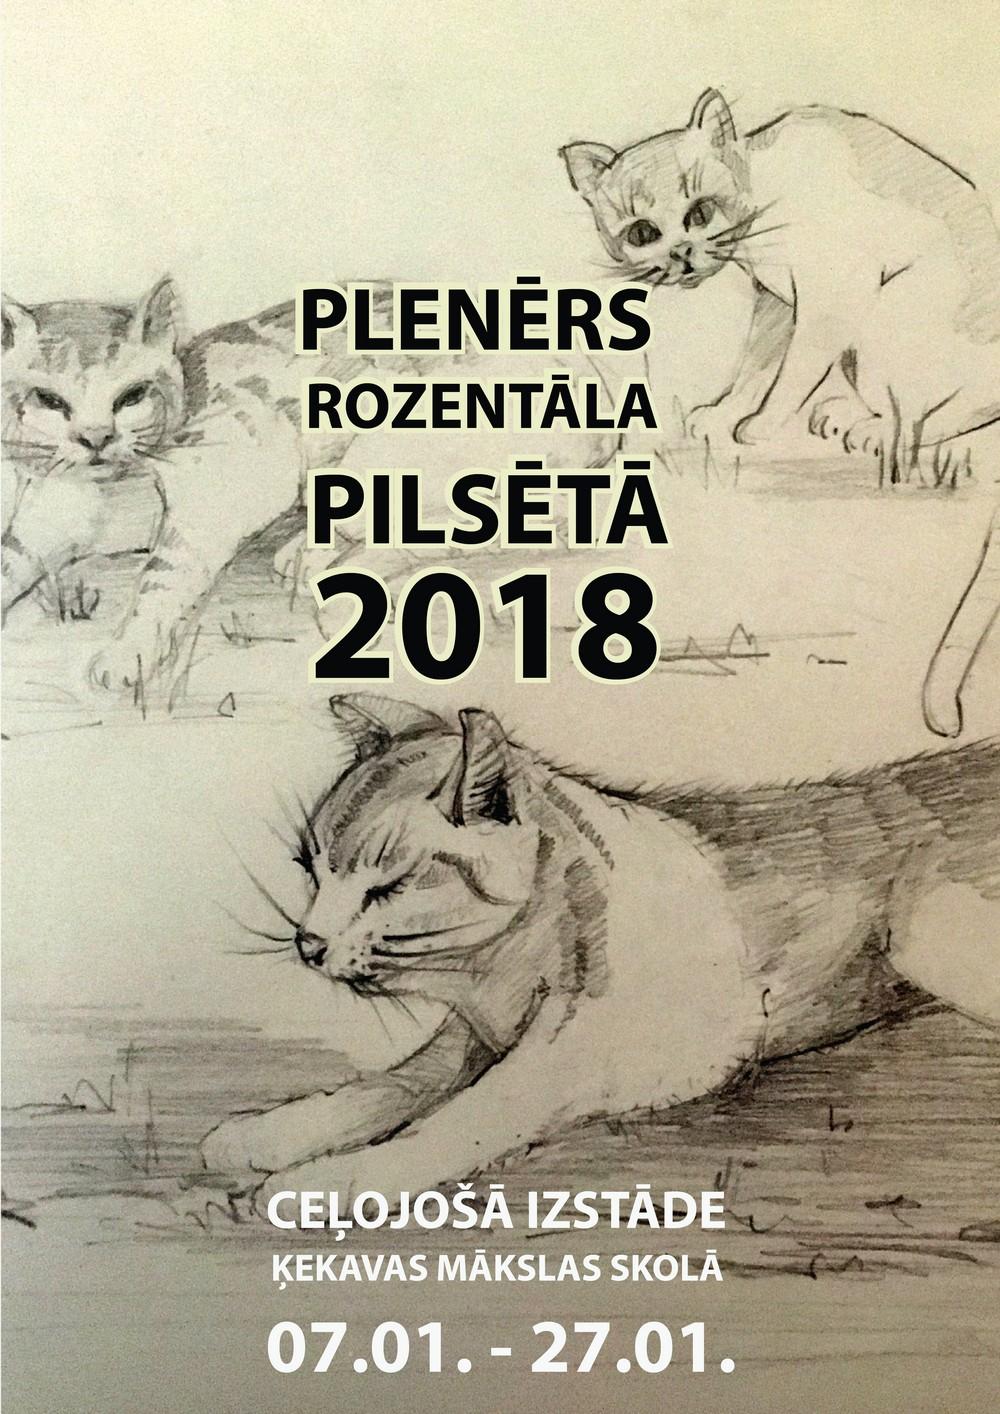 Izstades_2019_pleners Roz  pils_ML